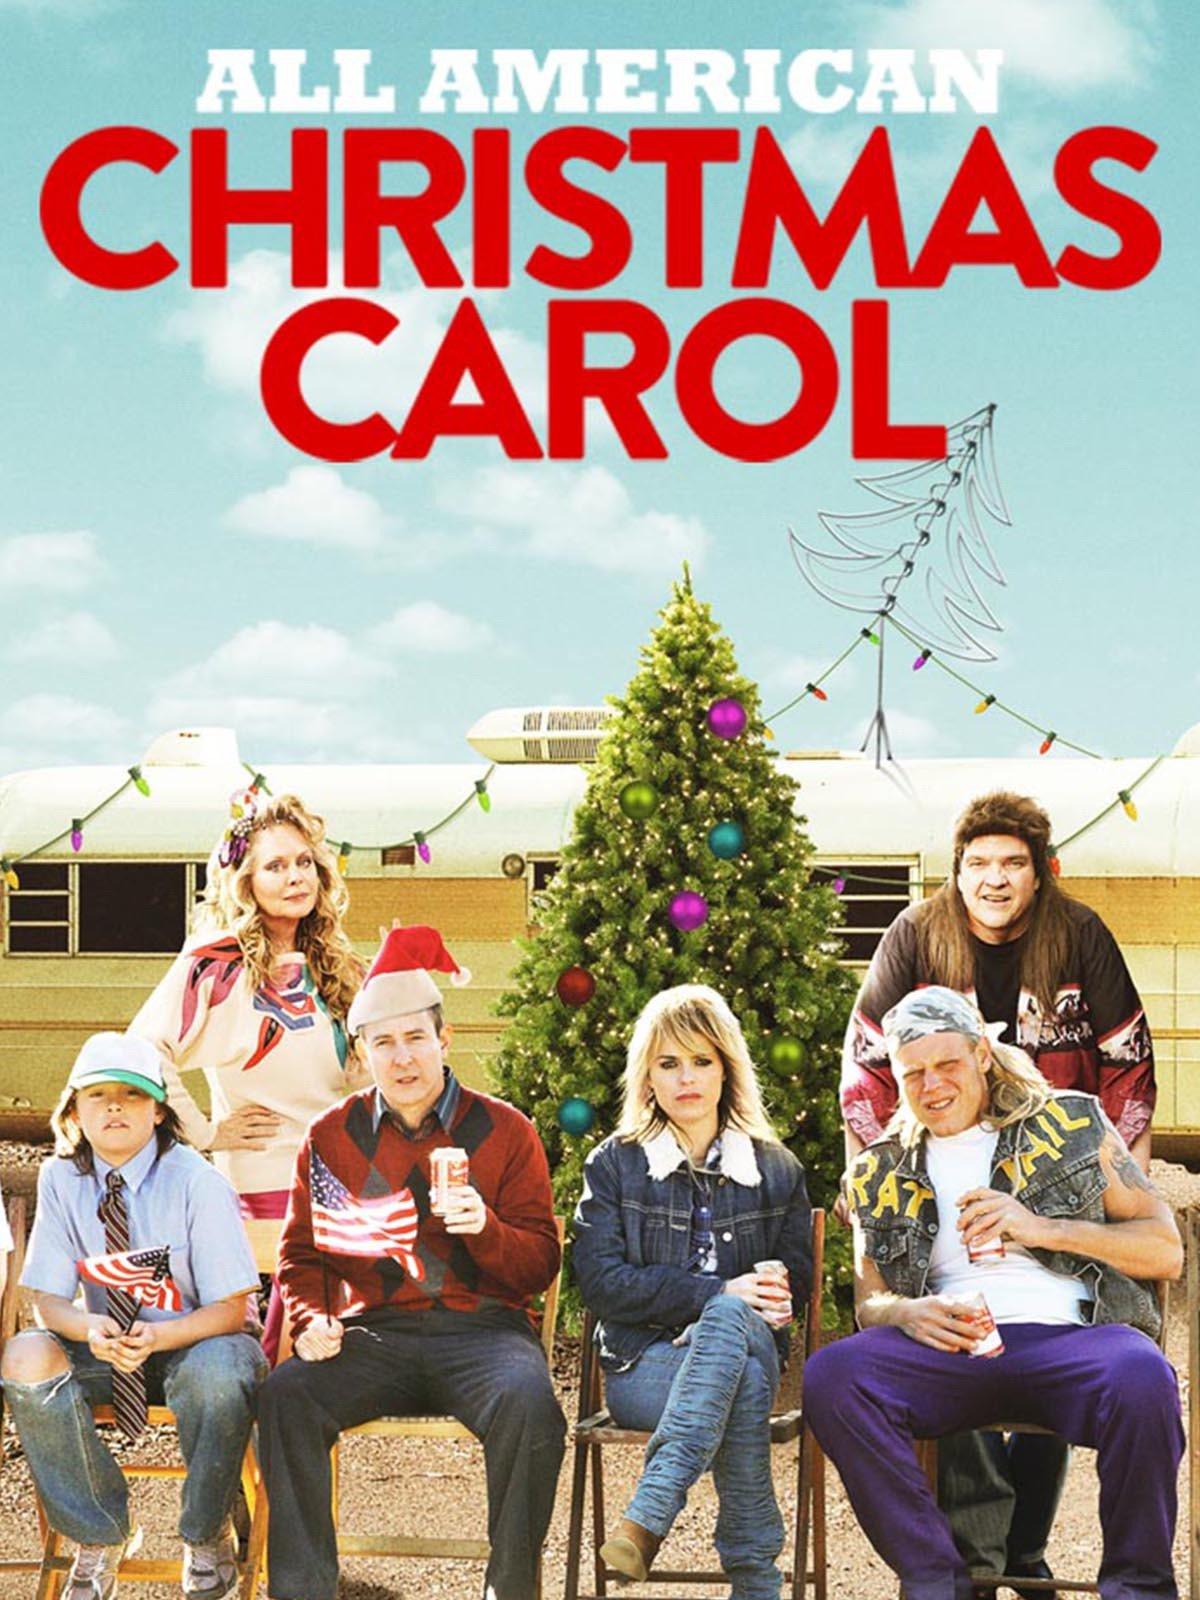 Amazon.com: All American Christmas Carol: Taryn Manning, Beverly D ...